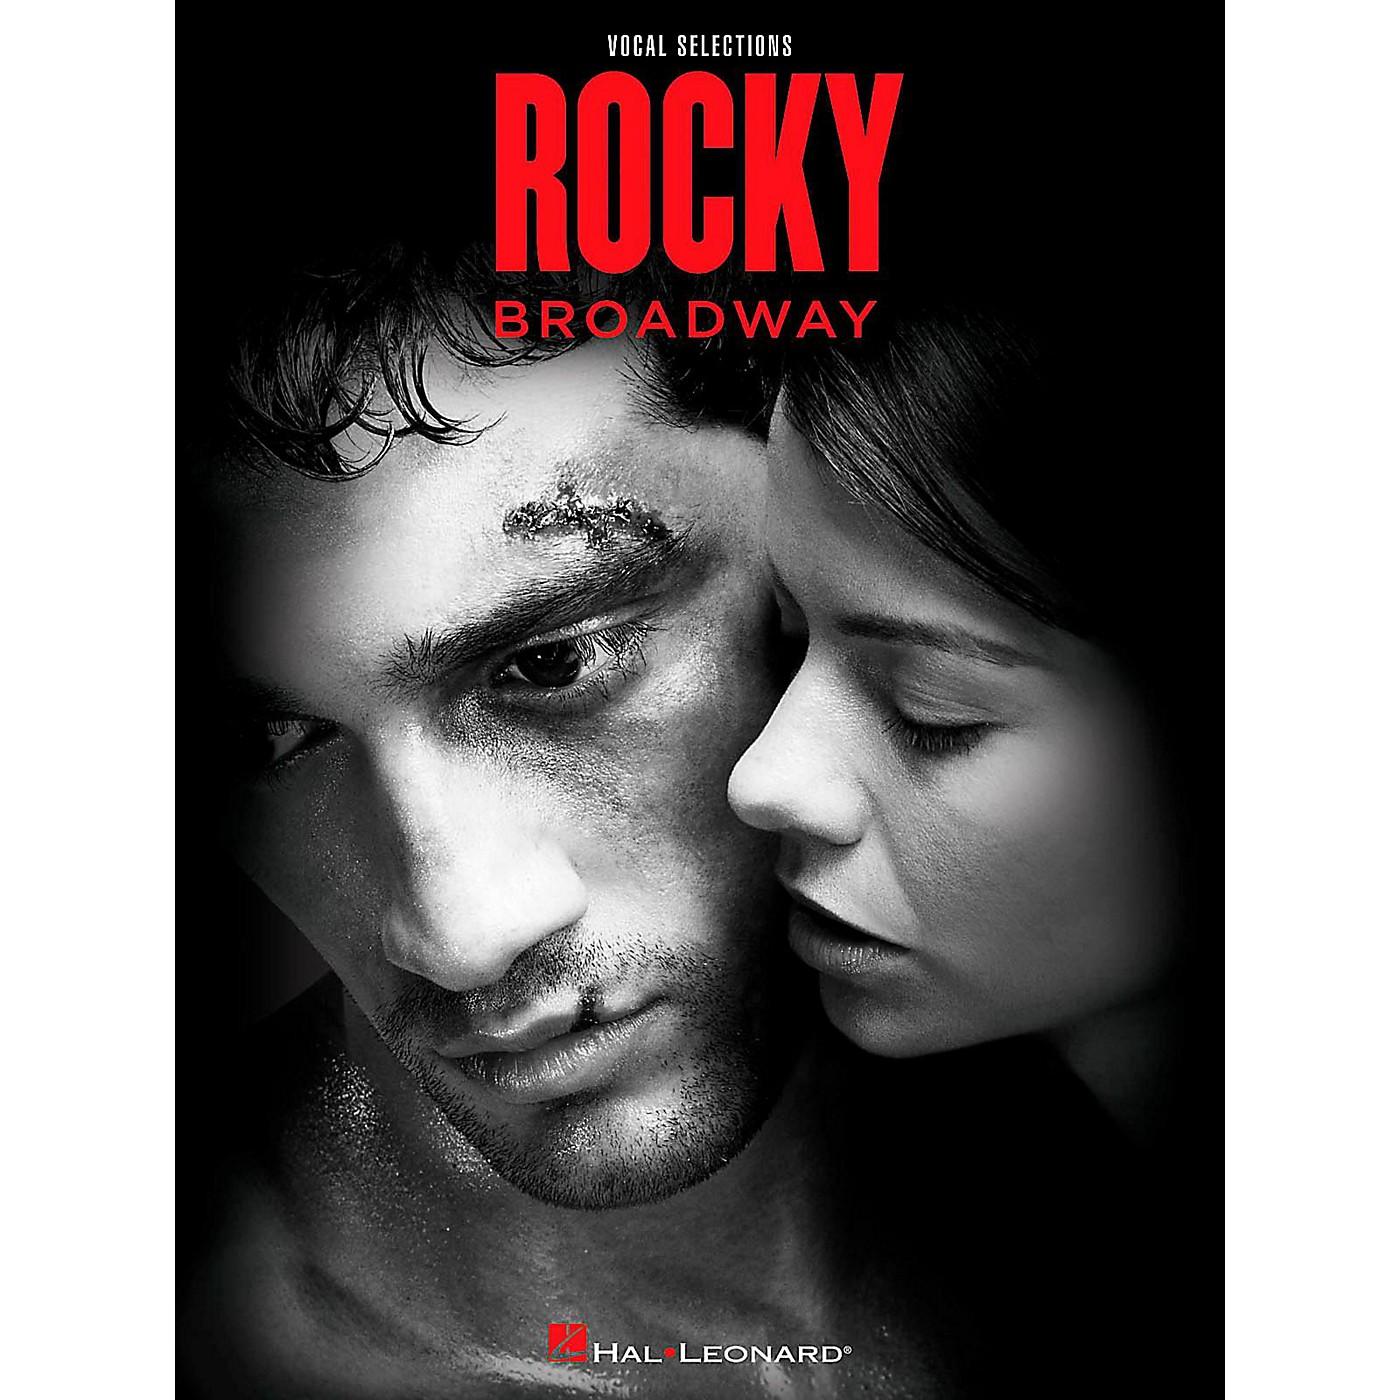 Hal Leonard Rocky Broadway - Vocal Selections thumbnail